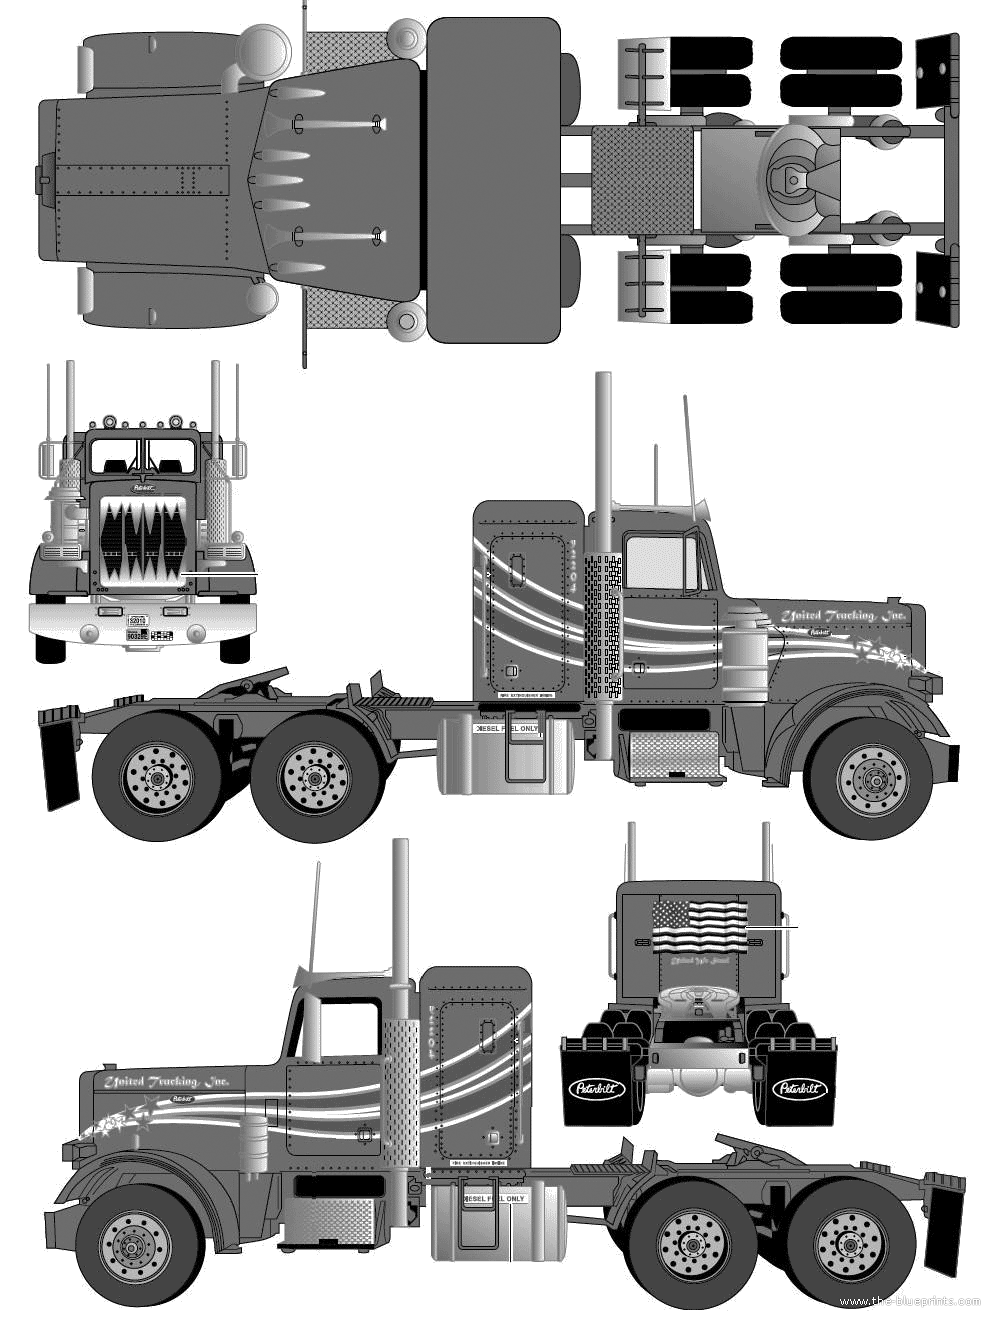 Blueprints > Trucks > Peterbilt > Peterbilt 359 Tractor